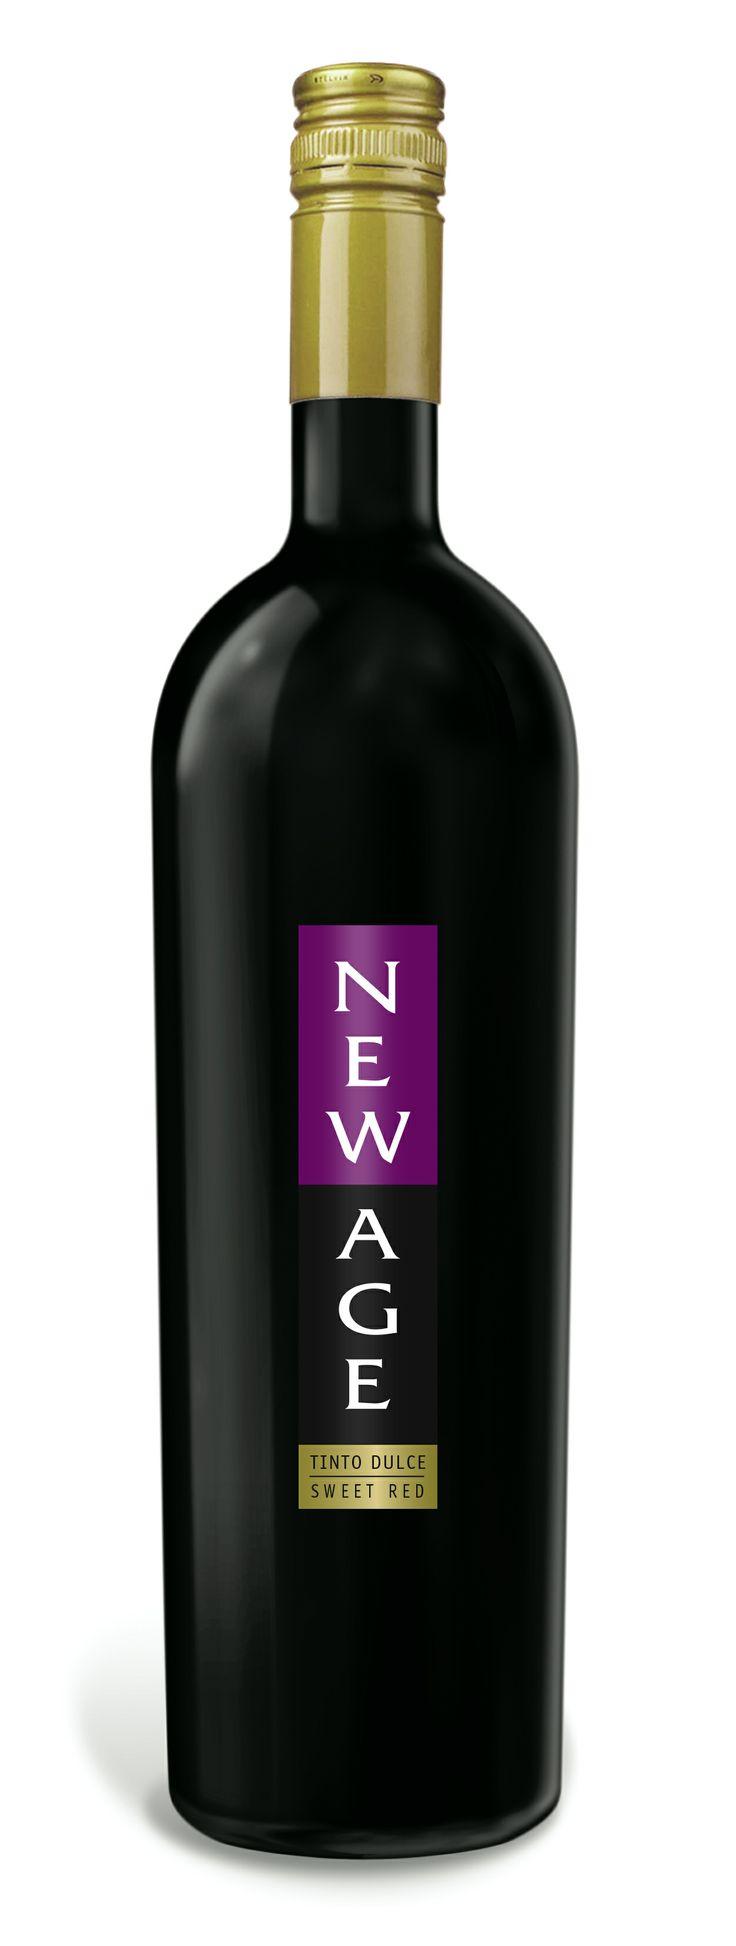 New Age Red Sweet Wine, un tinto dulce natural, con baja graduación alcoholica.